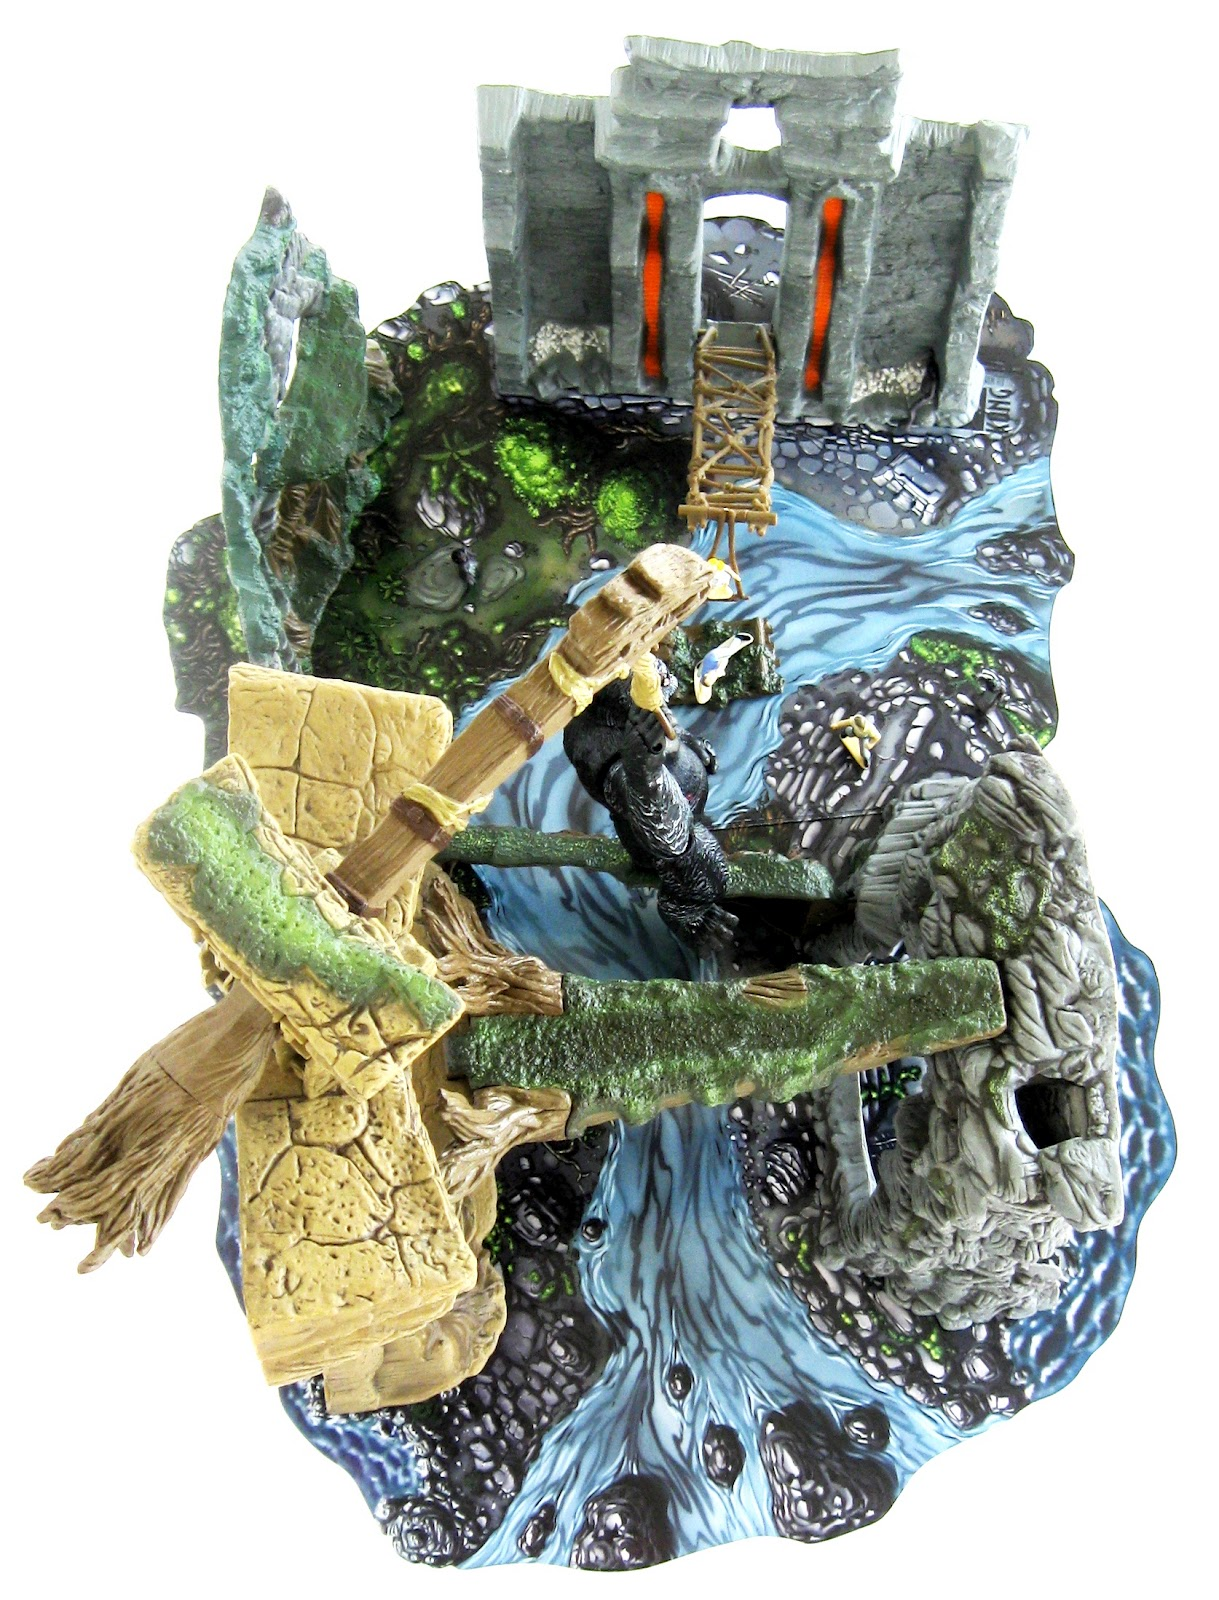 Toys And Stuff Playmates 66047 Skull Island Playset